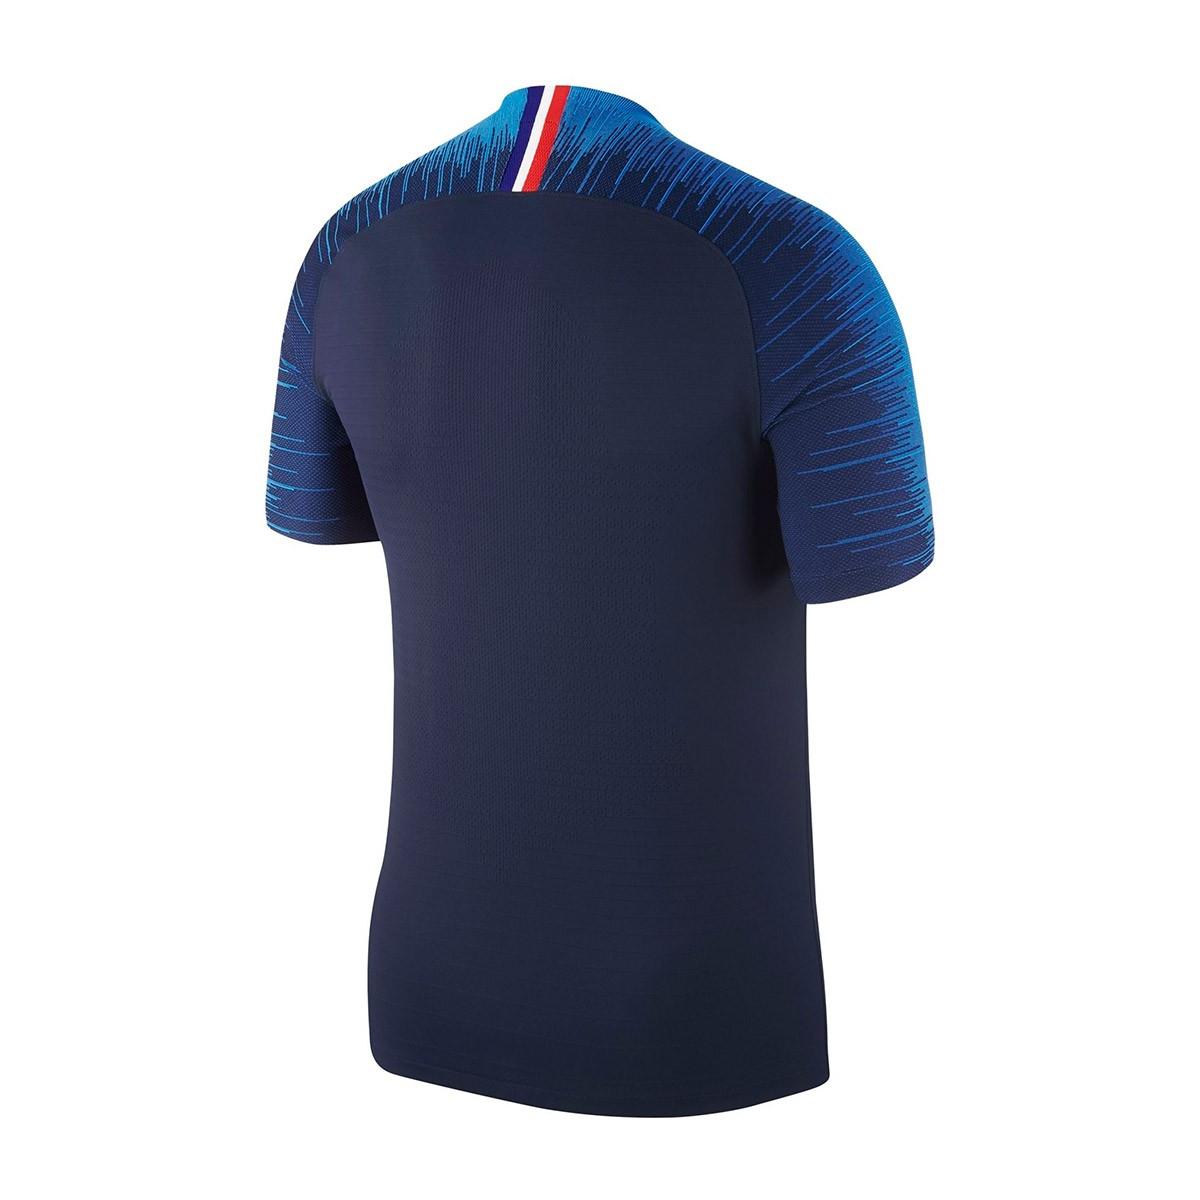 pretty nice 8c176 d210a Playera Nike Francia Vapor Primera Equipación 2018-2019 Obsidian-White -  Soloporteros es ahora Fútbol Emotion